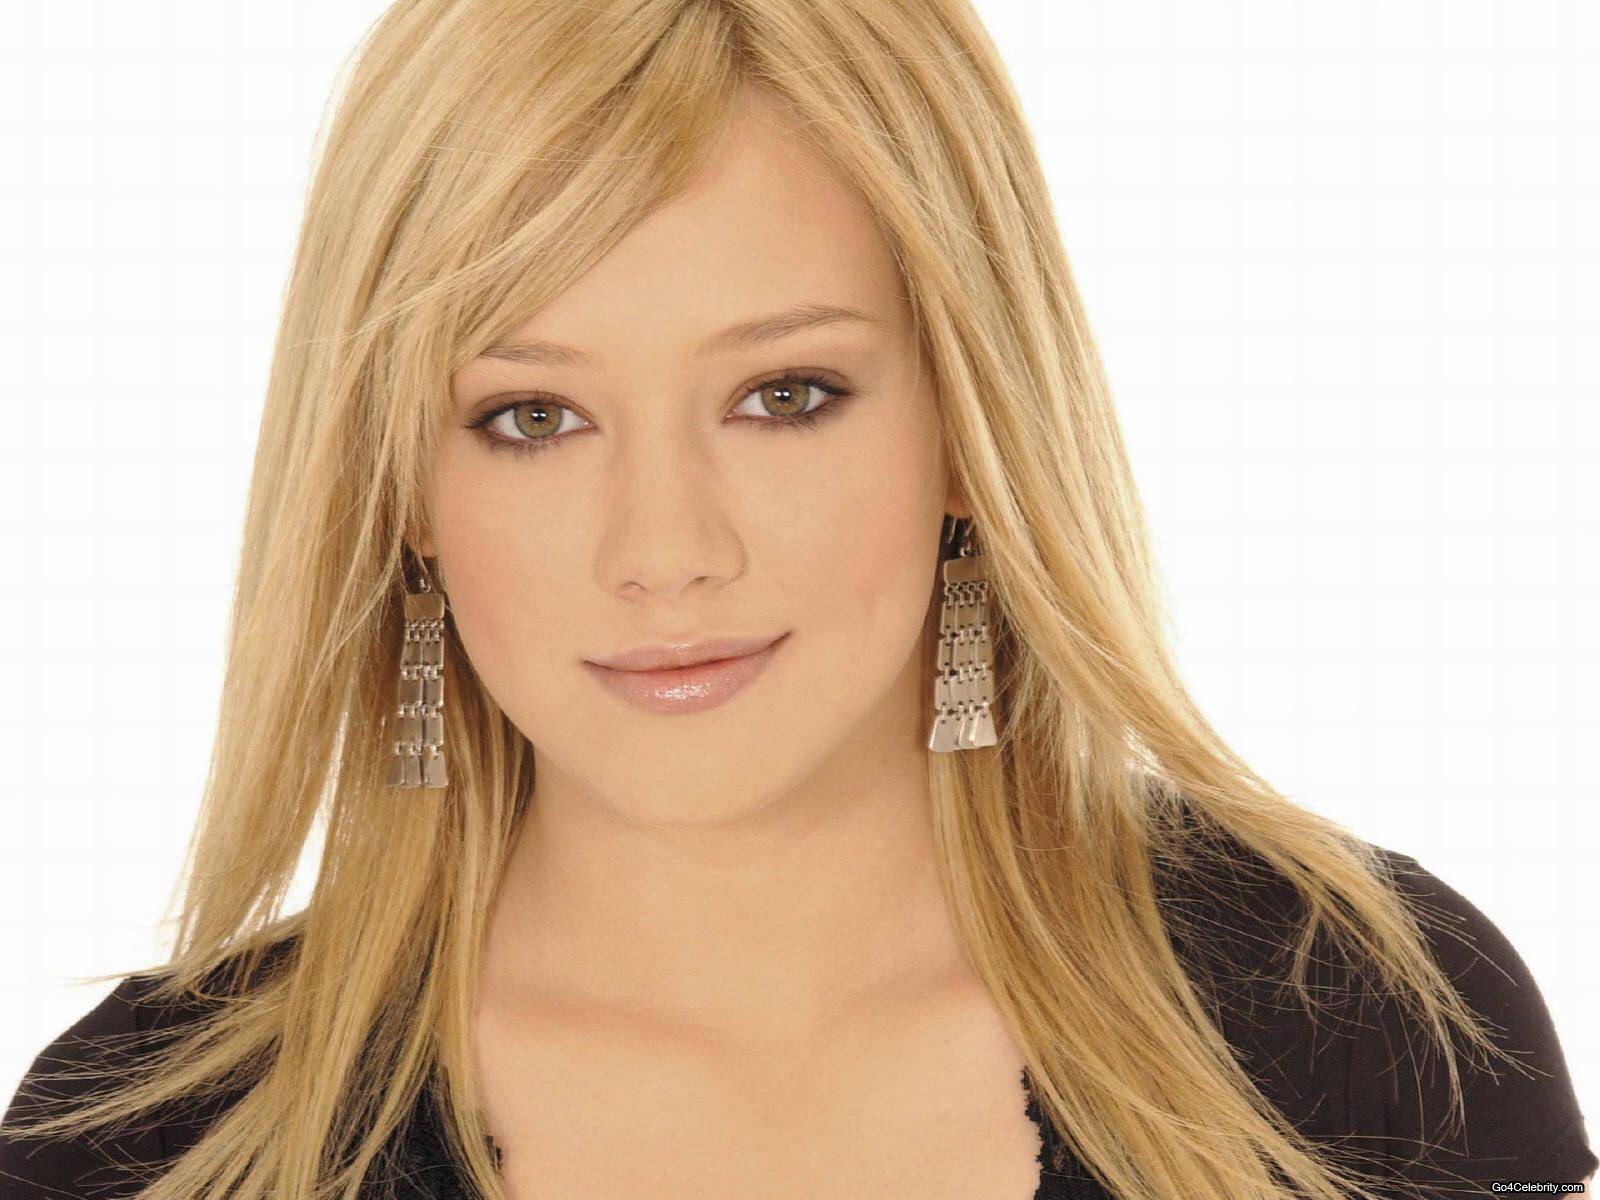 Raise Your Voice-(Sesini duyur) - Hilary duff resimler Hilary Duff